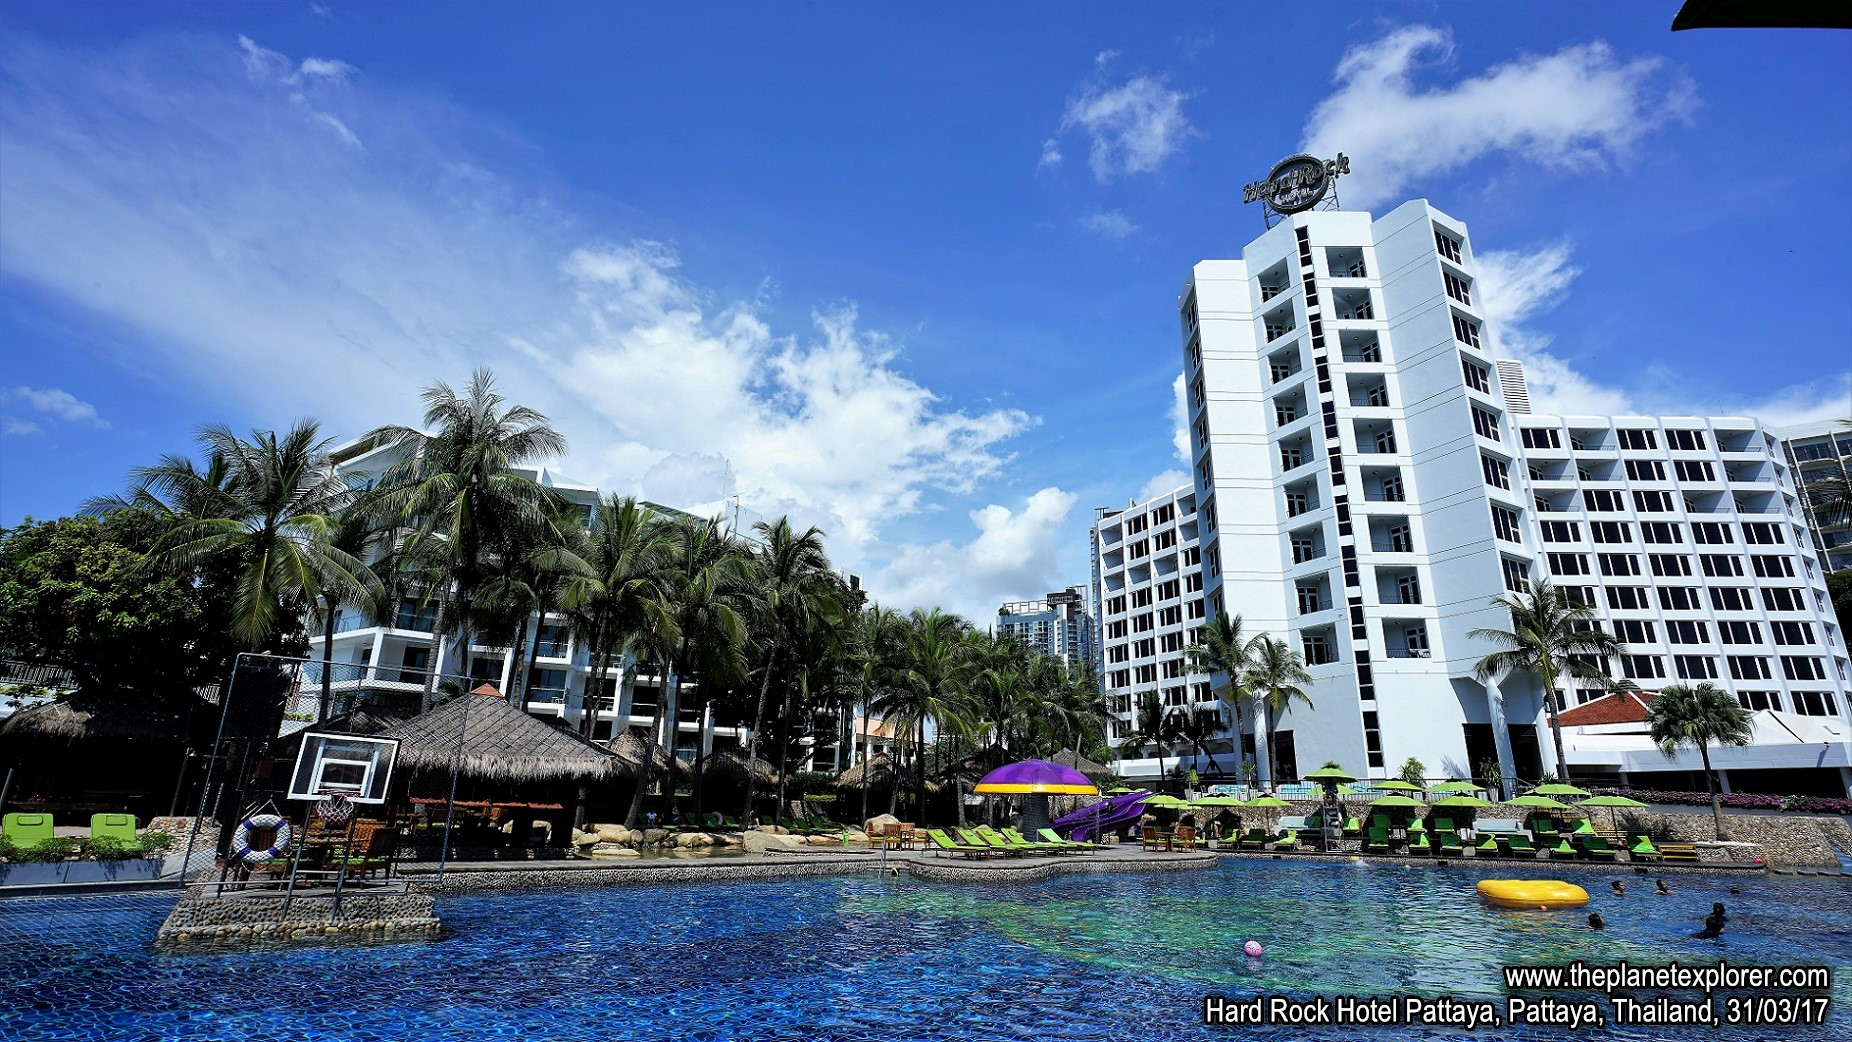 2017-03-31_1322_Thailand_Pattaya_Hard Rock Hotel Pattaya_DSC03898_s7R2_LR_@